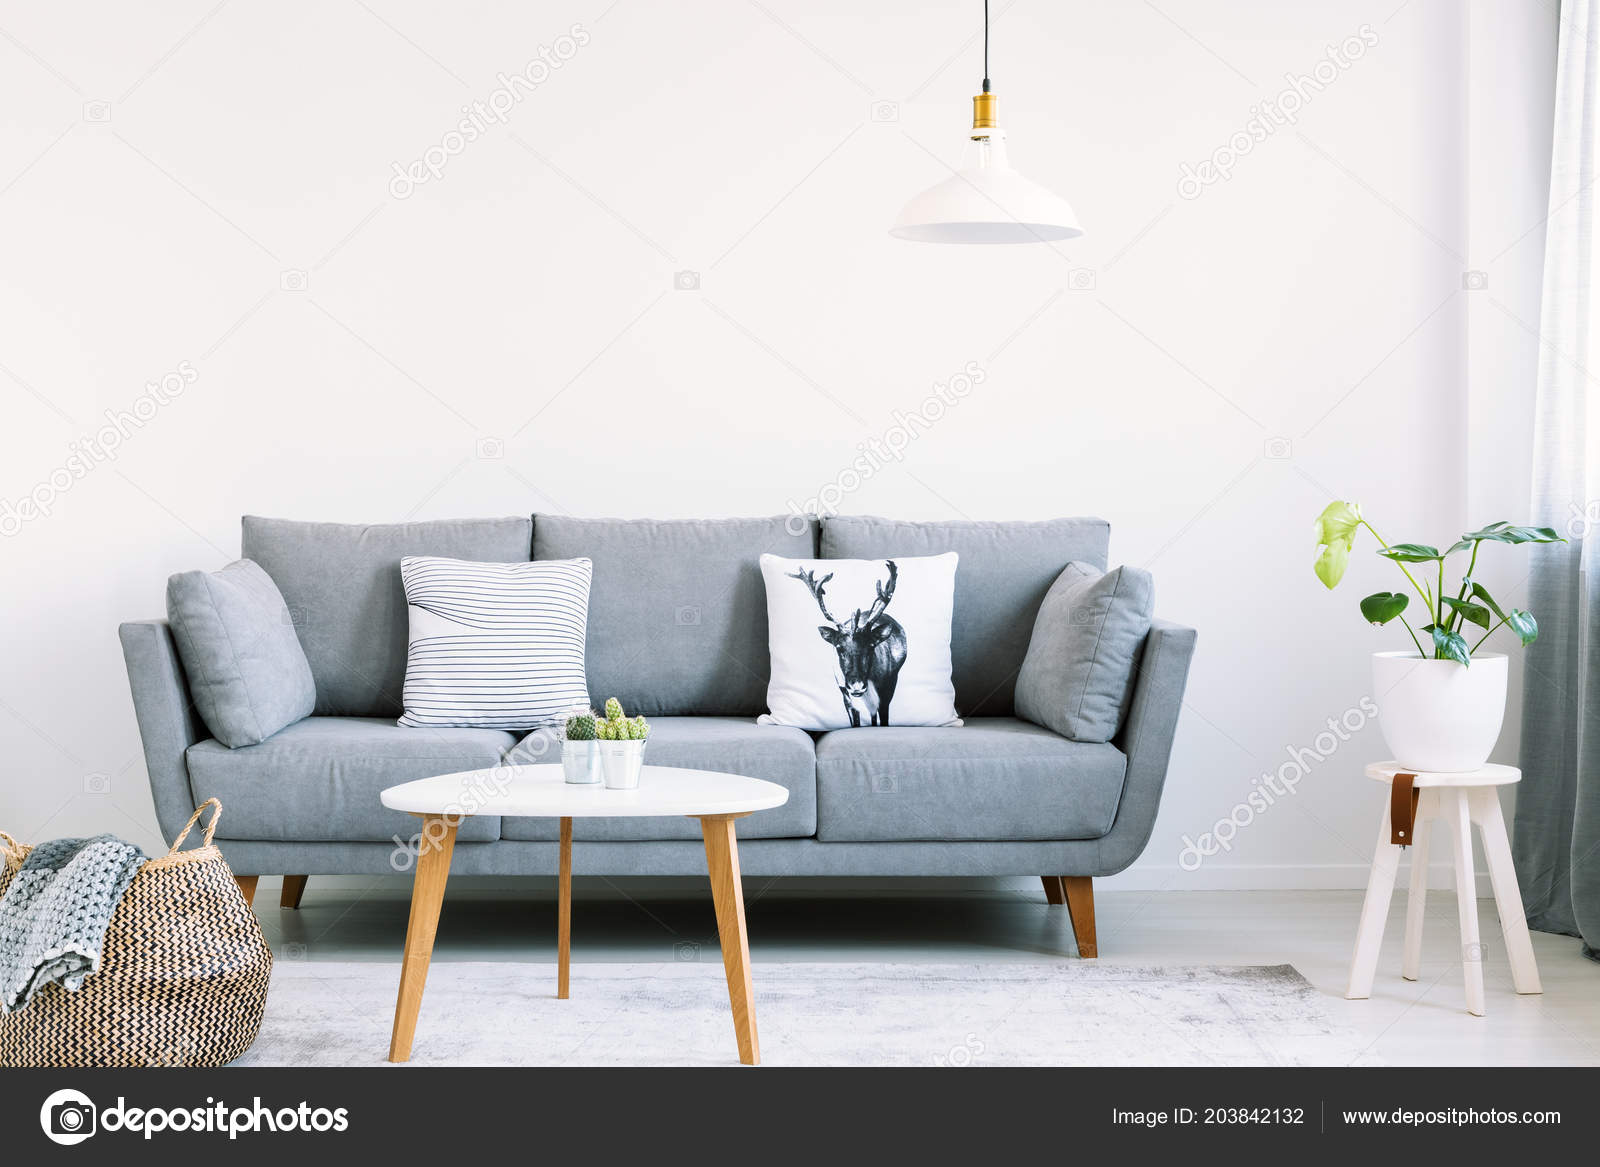 Prime Simple Interior Bright Living Room White Pillows Gray Sofa Creativecarmelina Interior Chair Design Creativecarmelinacom